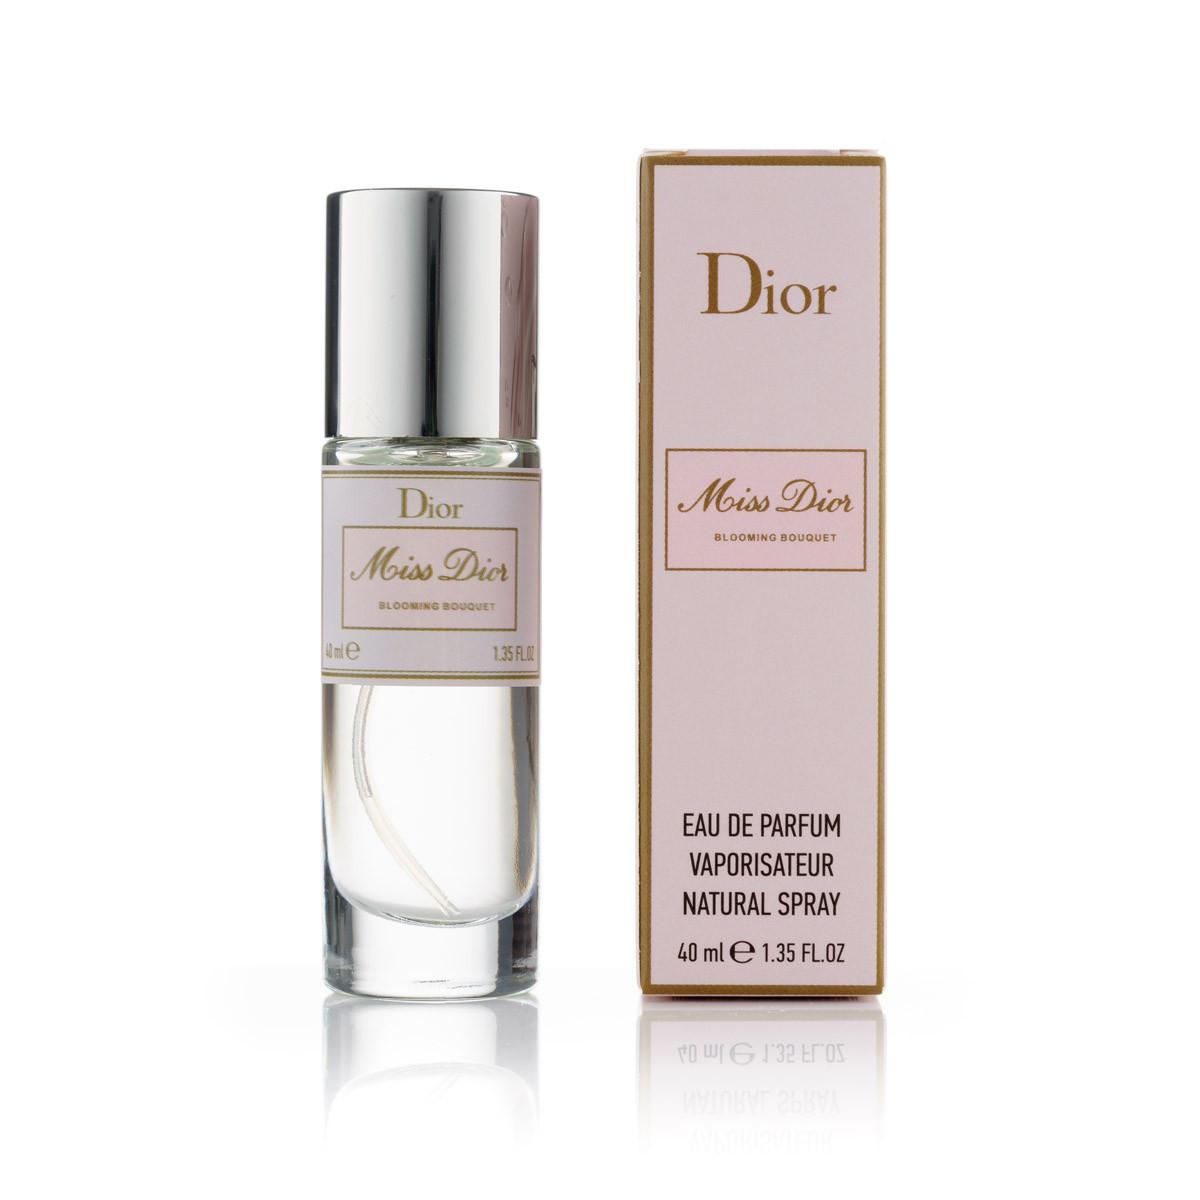 Женский мини парфюм Miss Blooming Bouquet - 40 мл (320)